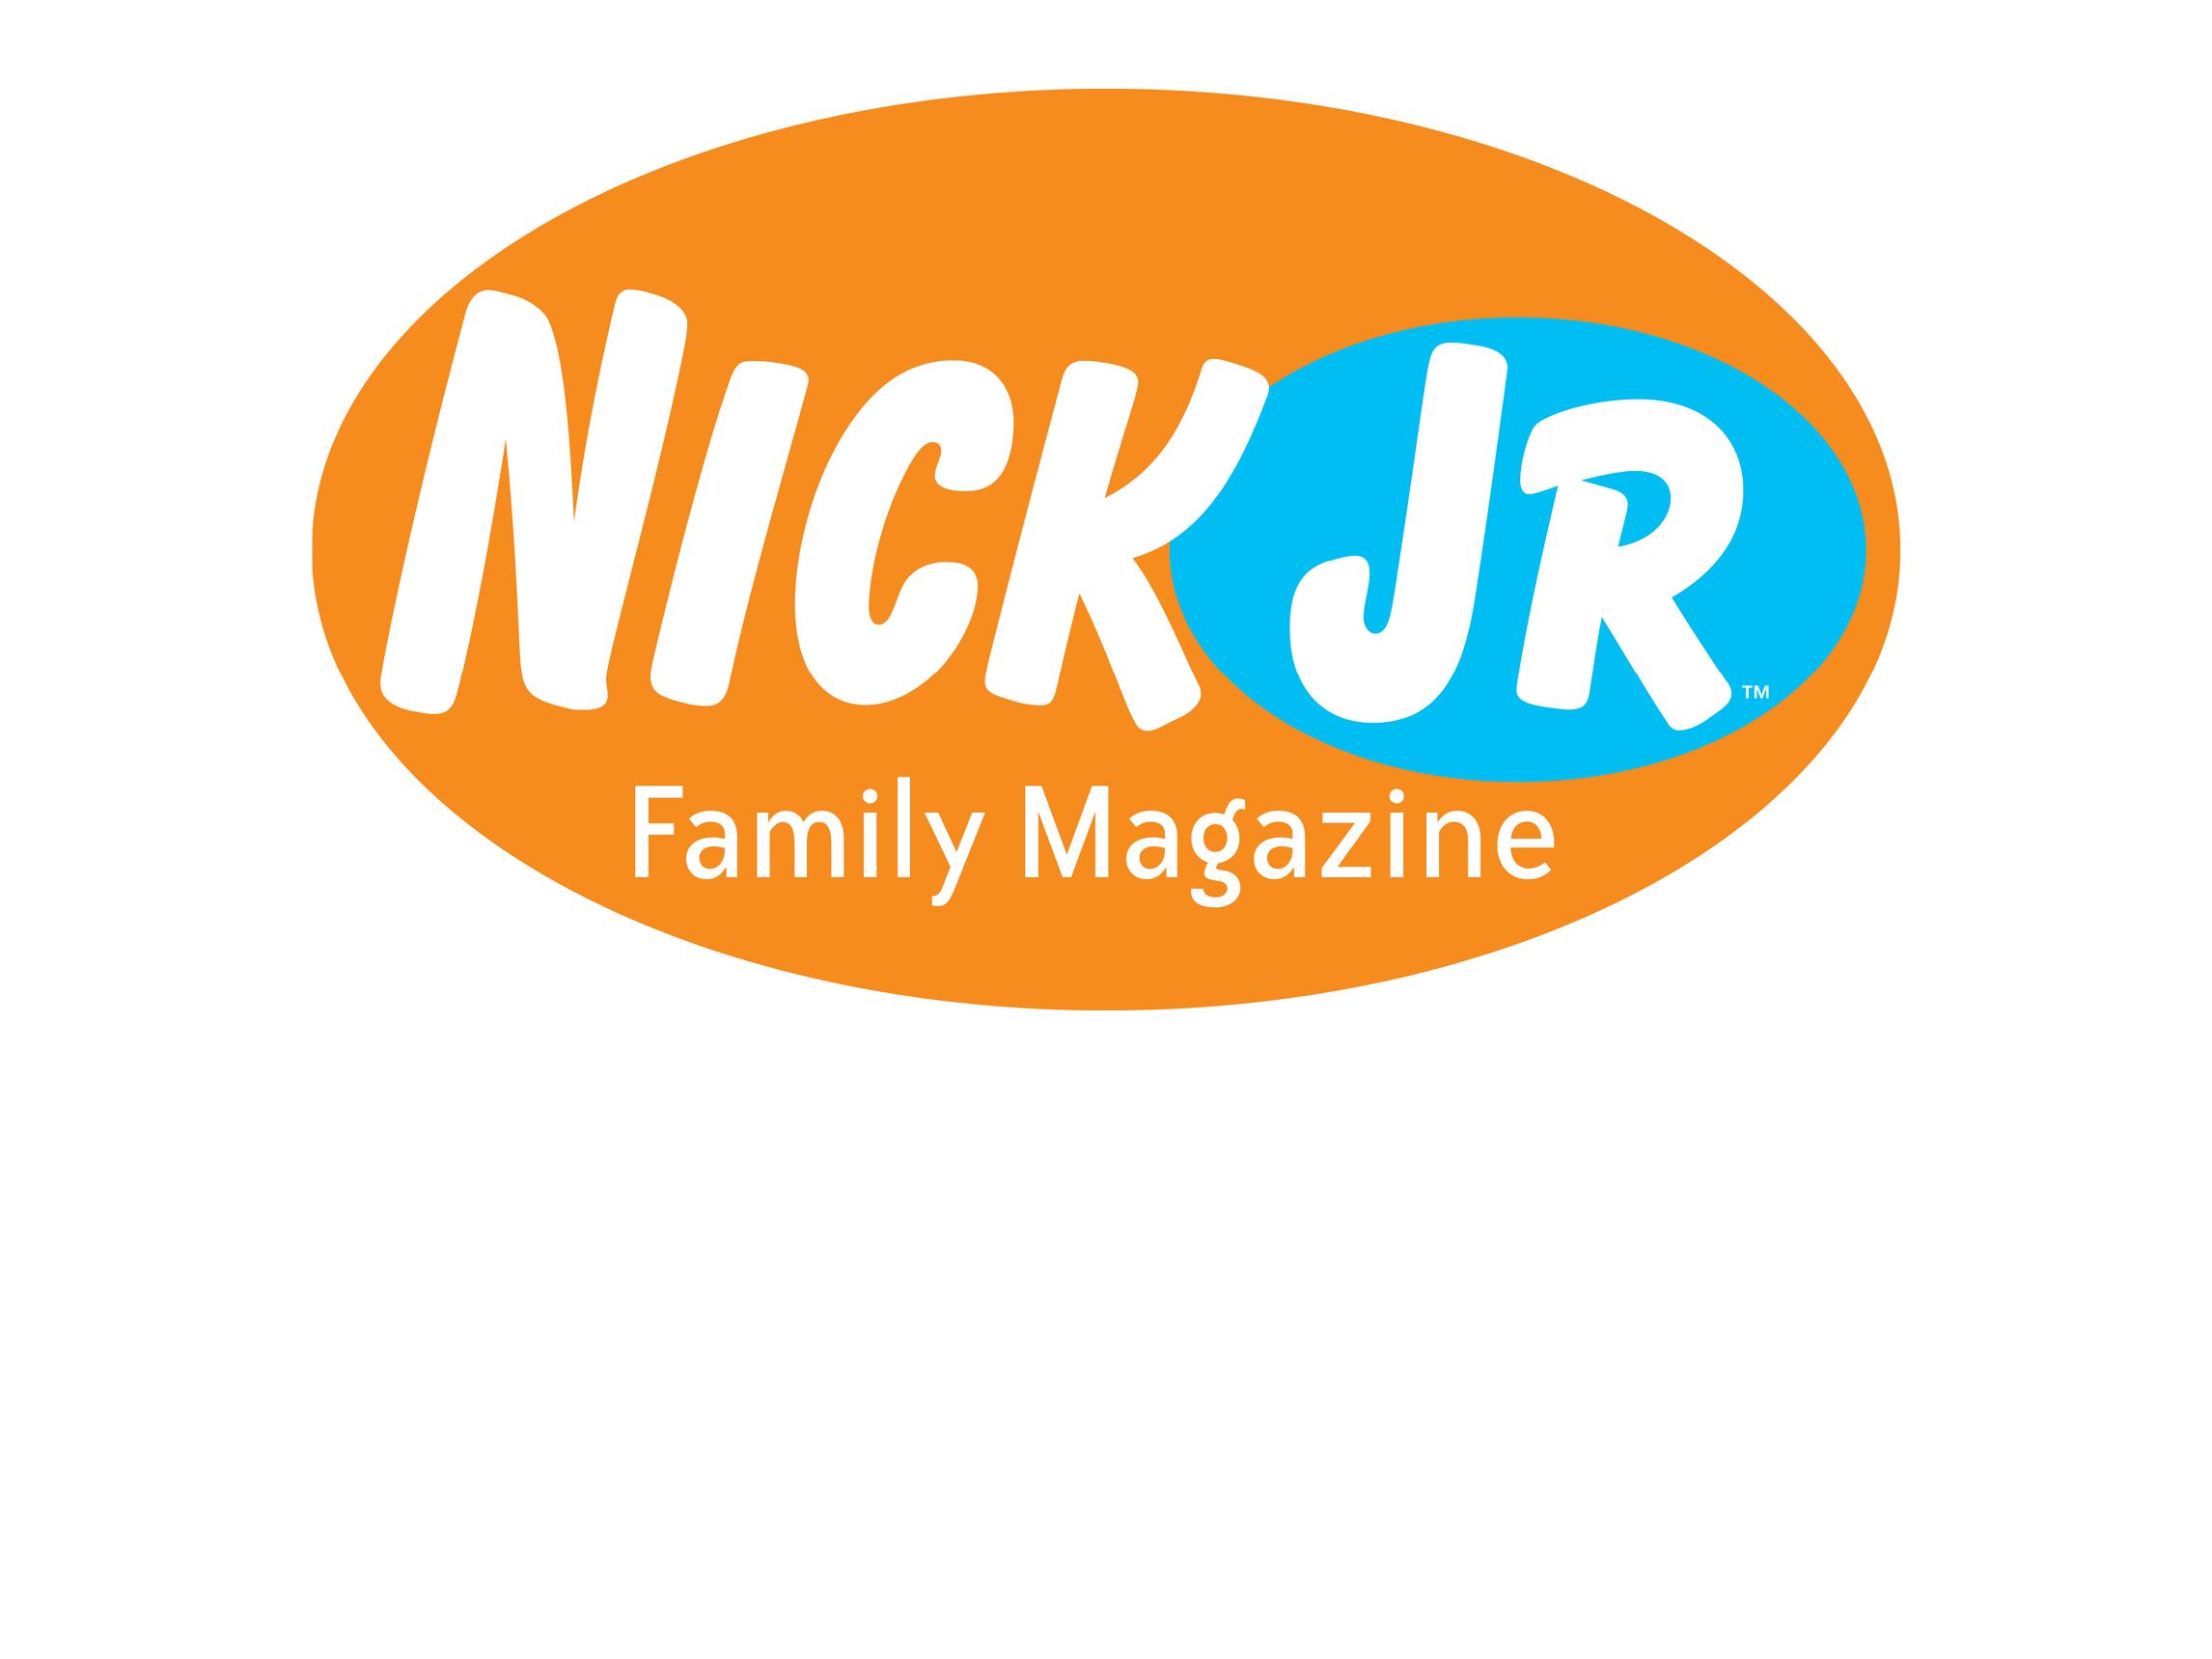 DMD_Logos_NickJr_150.jpg